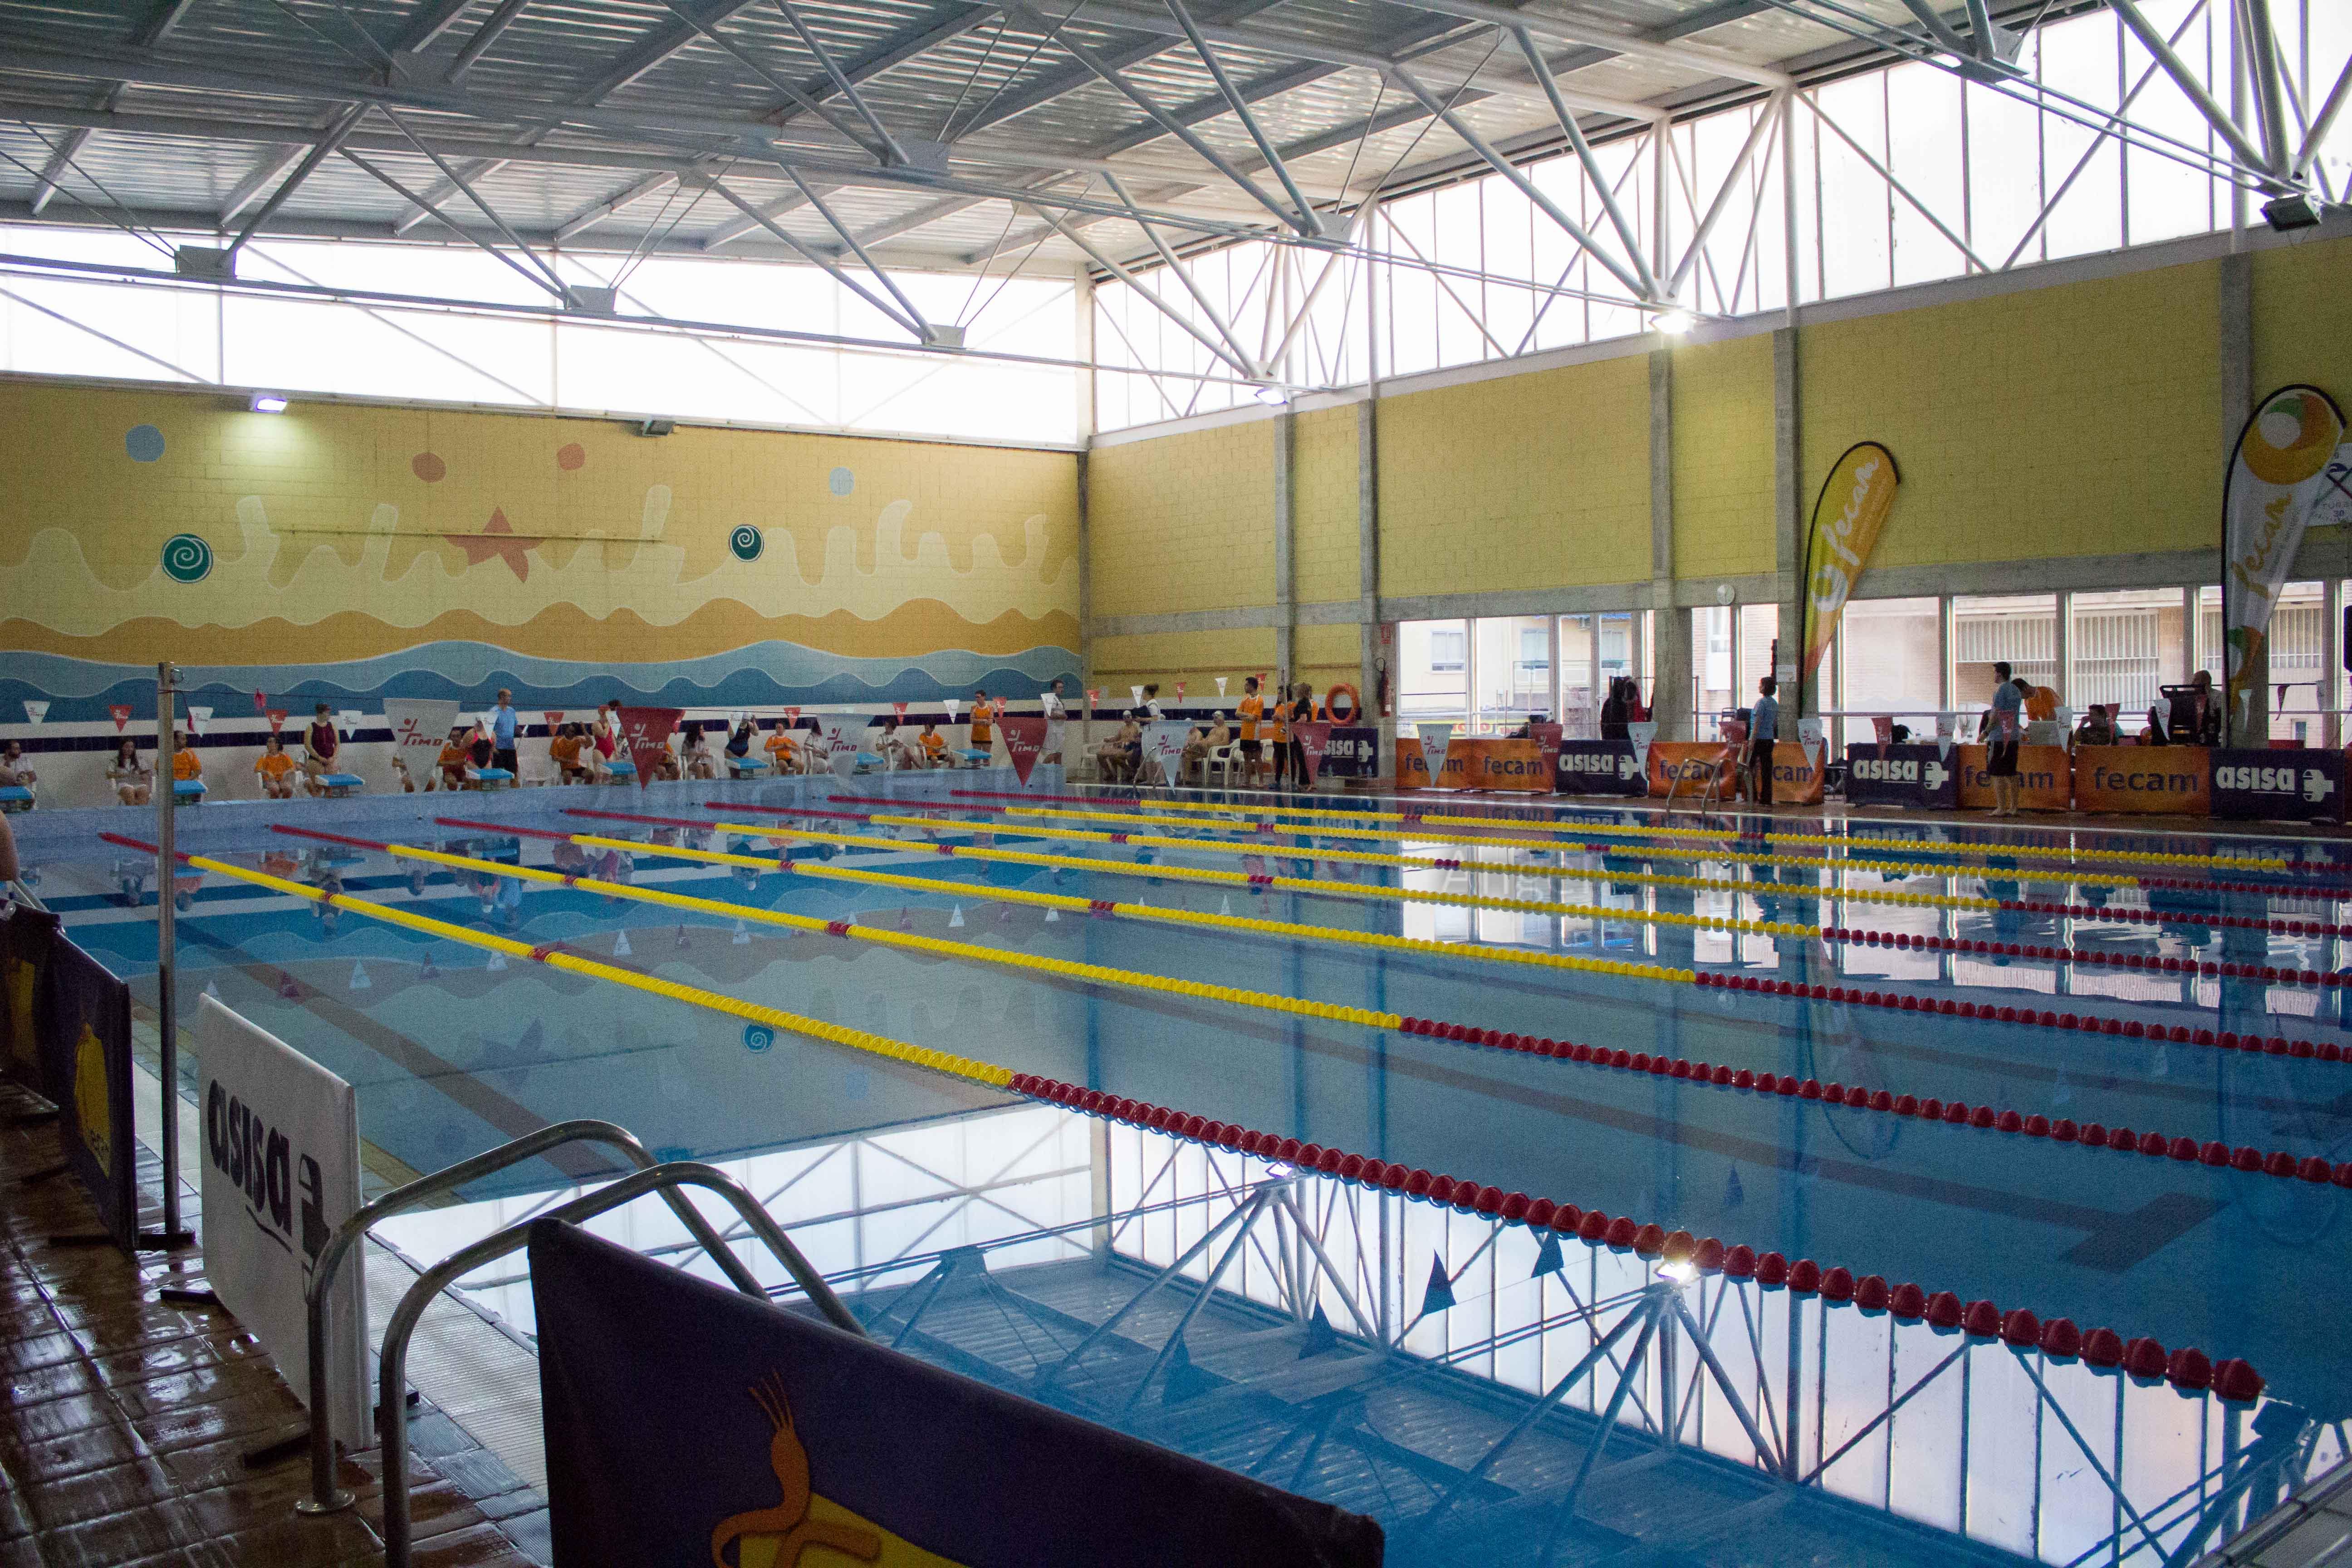 la piscina juan de toledo en albacete alberga este fin de